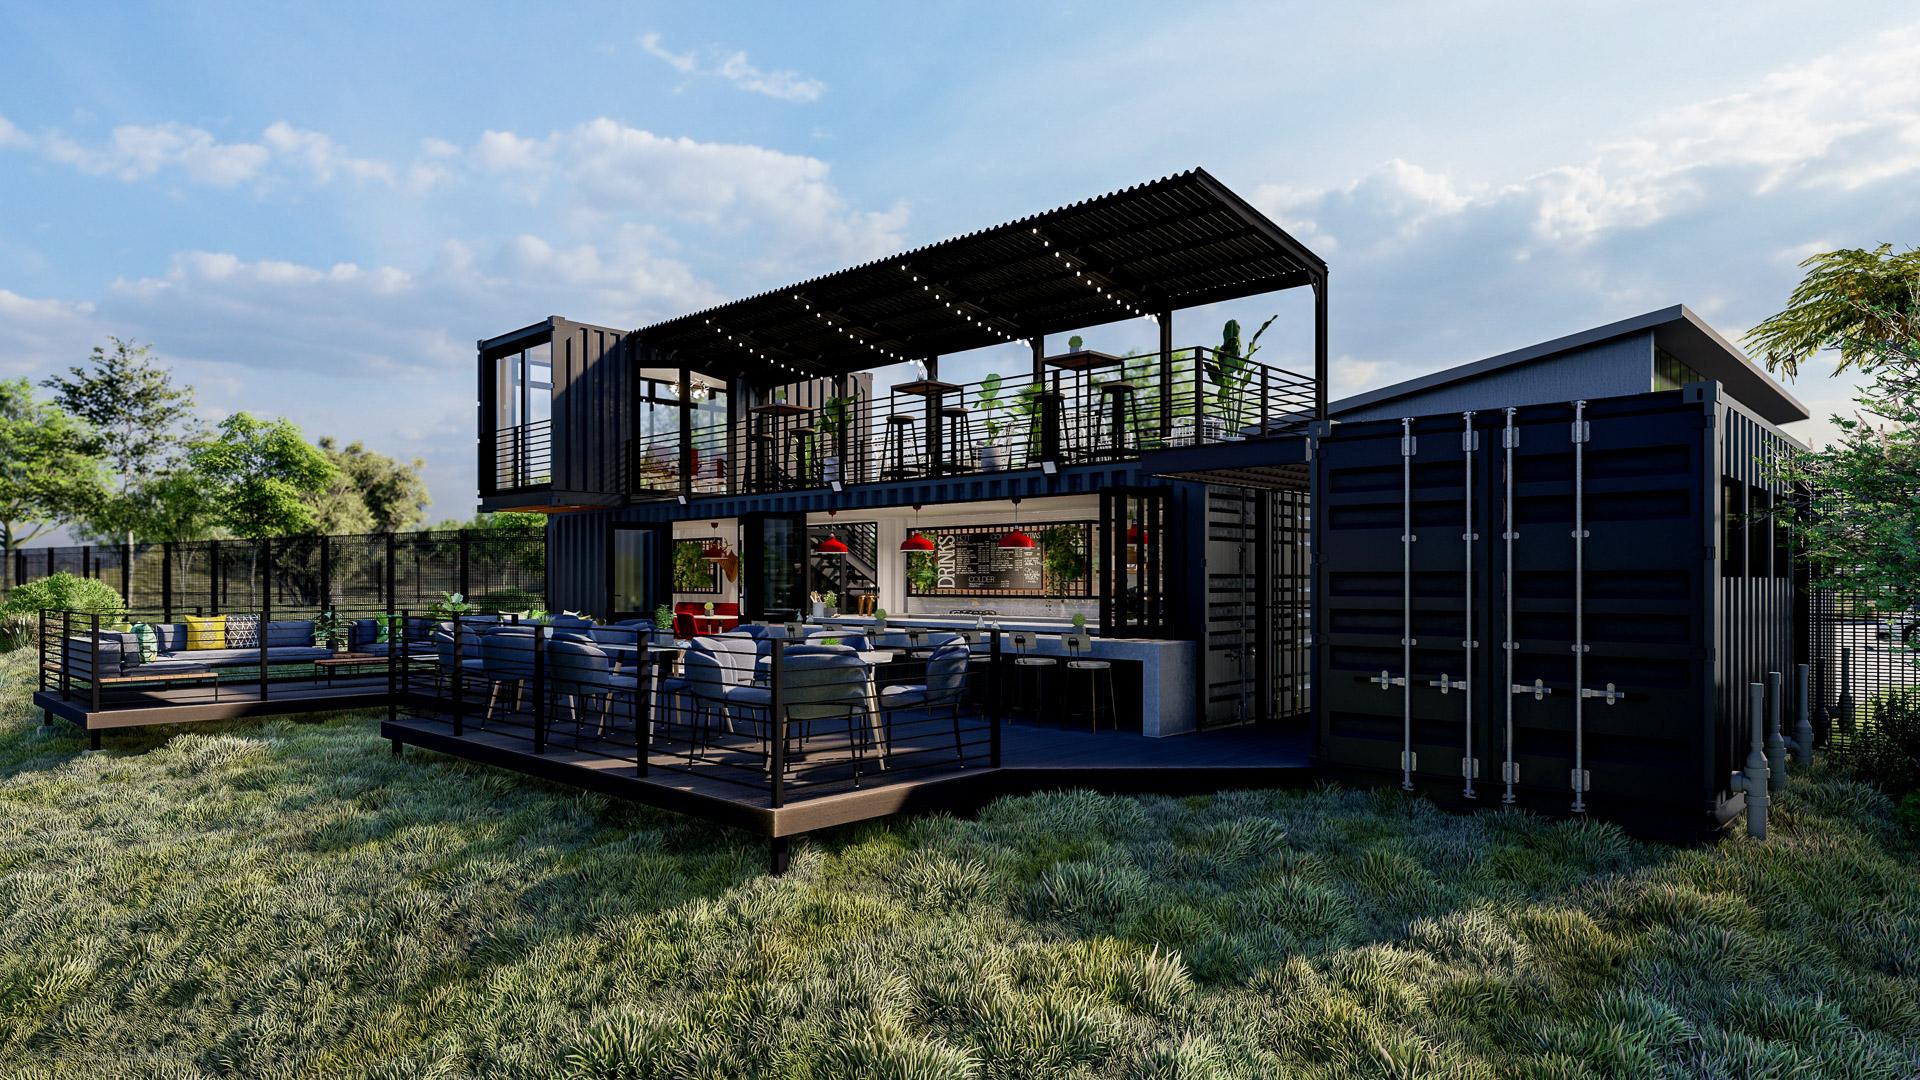 RHPX_Portfolio_LVR Container Restaurant-3